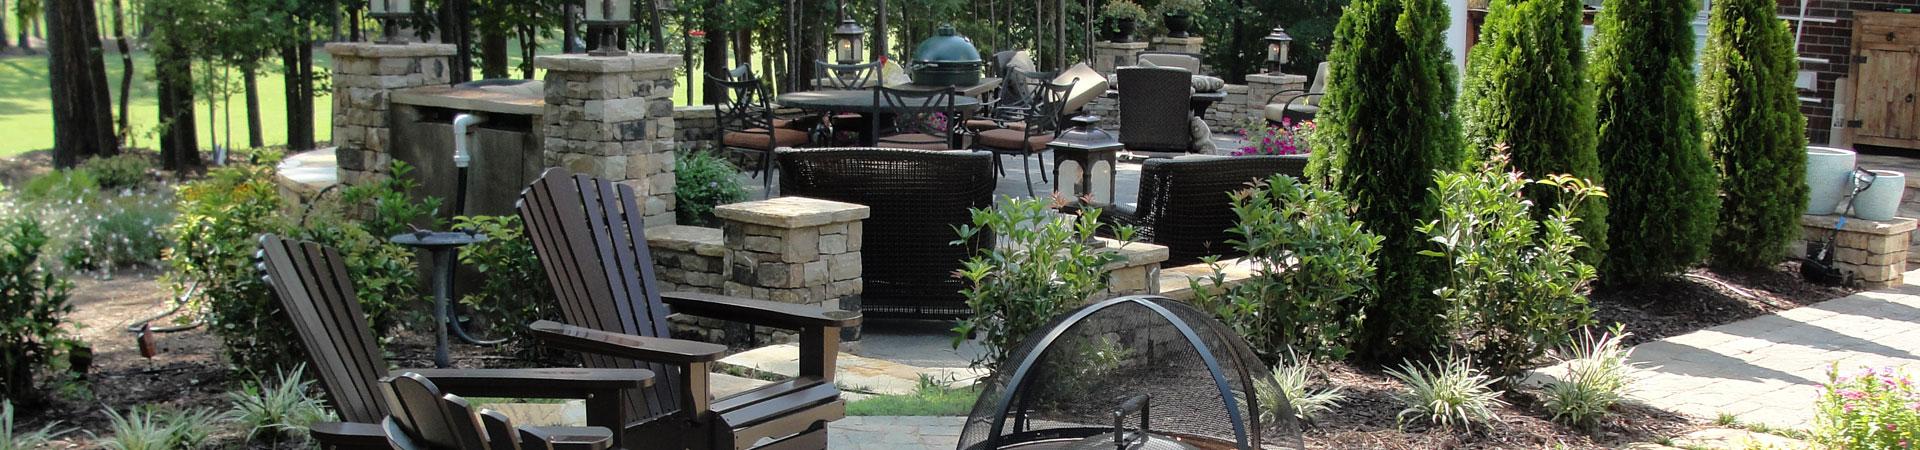 backyard patio with garden furniture